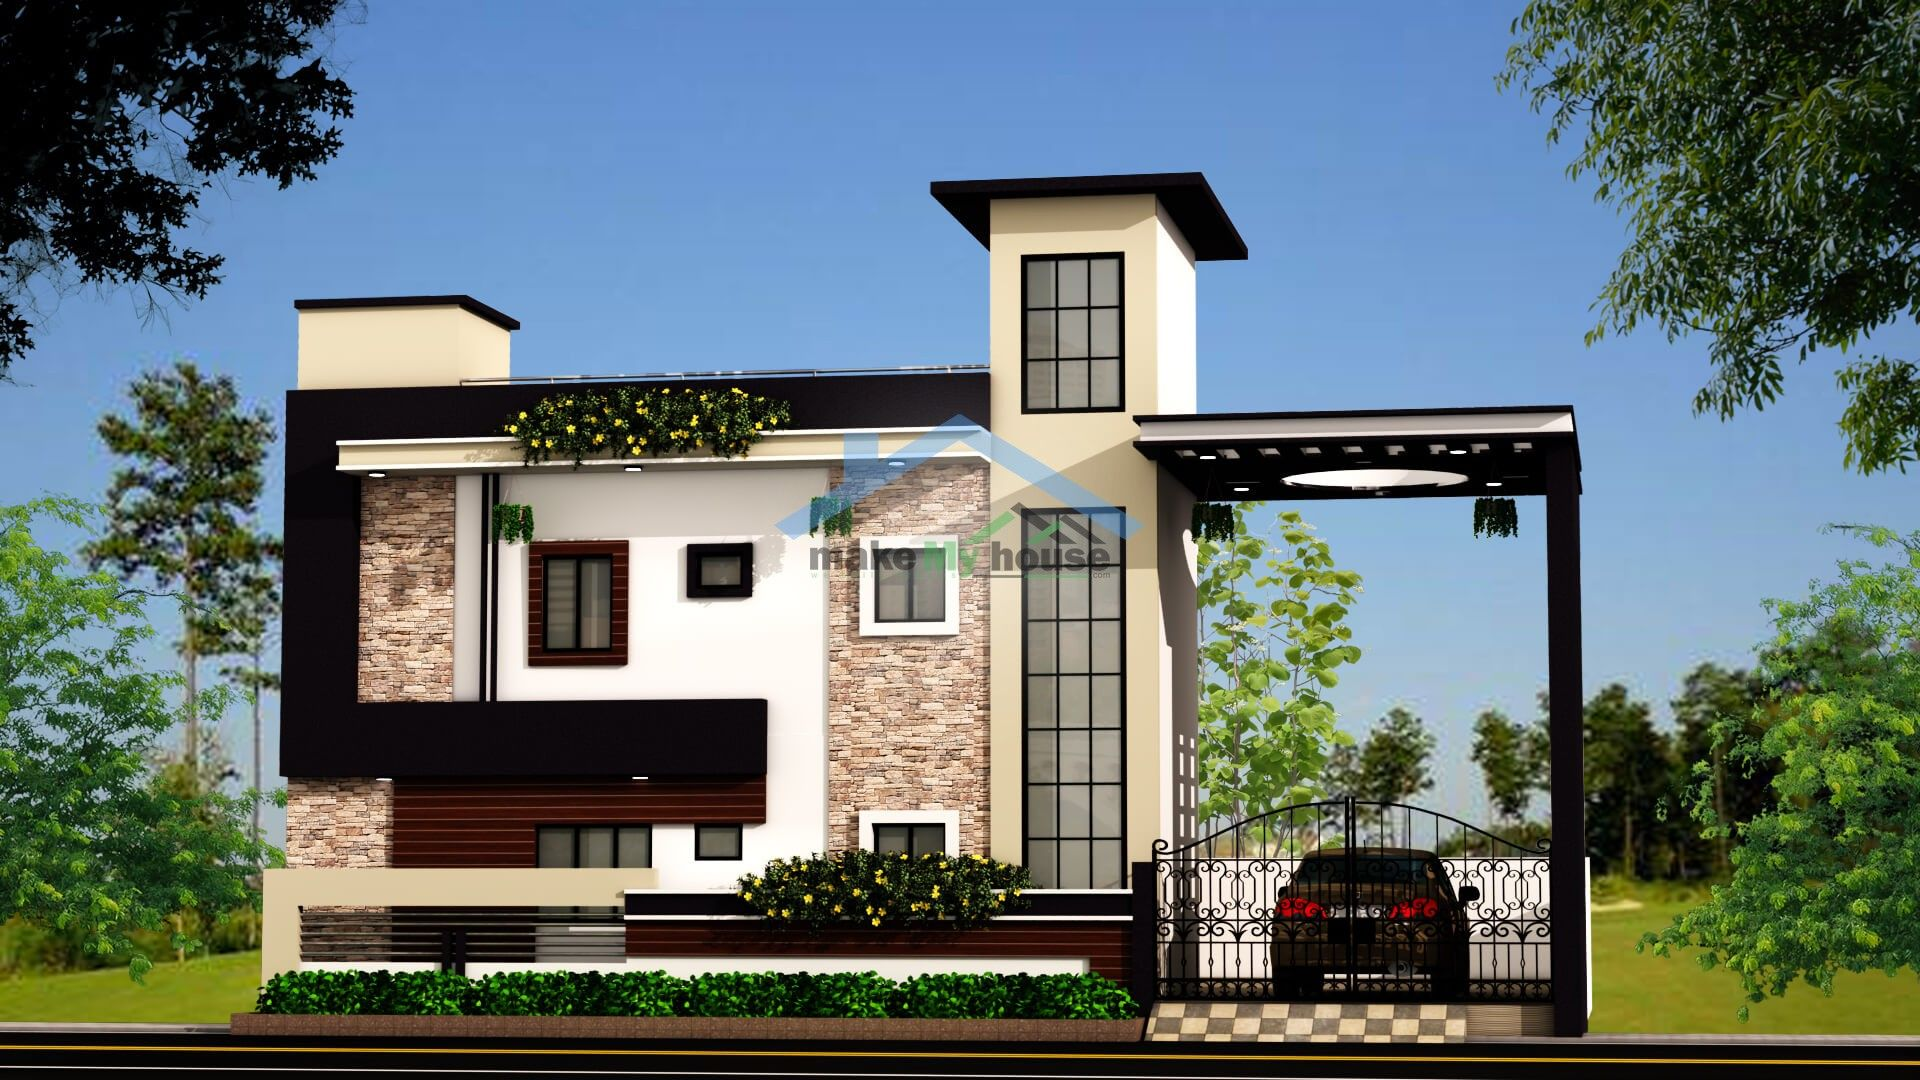 Lovely Interior Design My House Photos Online Home Design Design Home Hack House Design Games